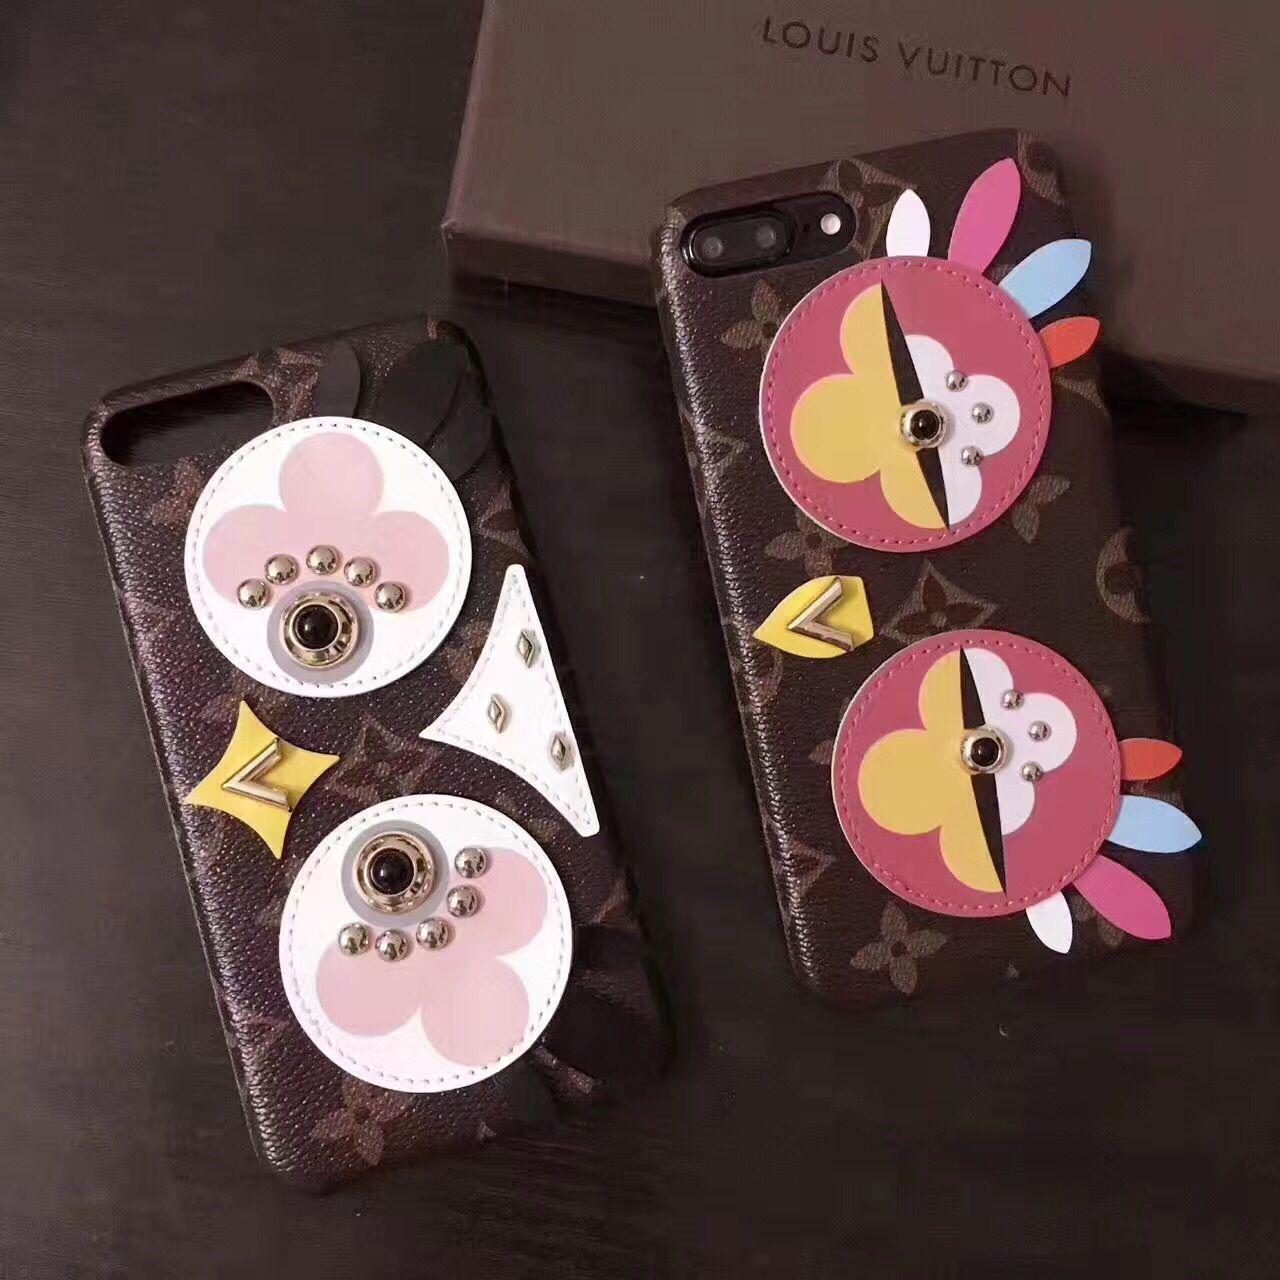 iphone hülle online shop iphone case gestalten Louis Vuitton iphone 8 hüllen apple ca8 iphone 8 iphone 8 etui iphone 8 8 hülle handytasche für iphone 8 iphone hülle designen iphone ca8 elber machen